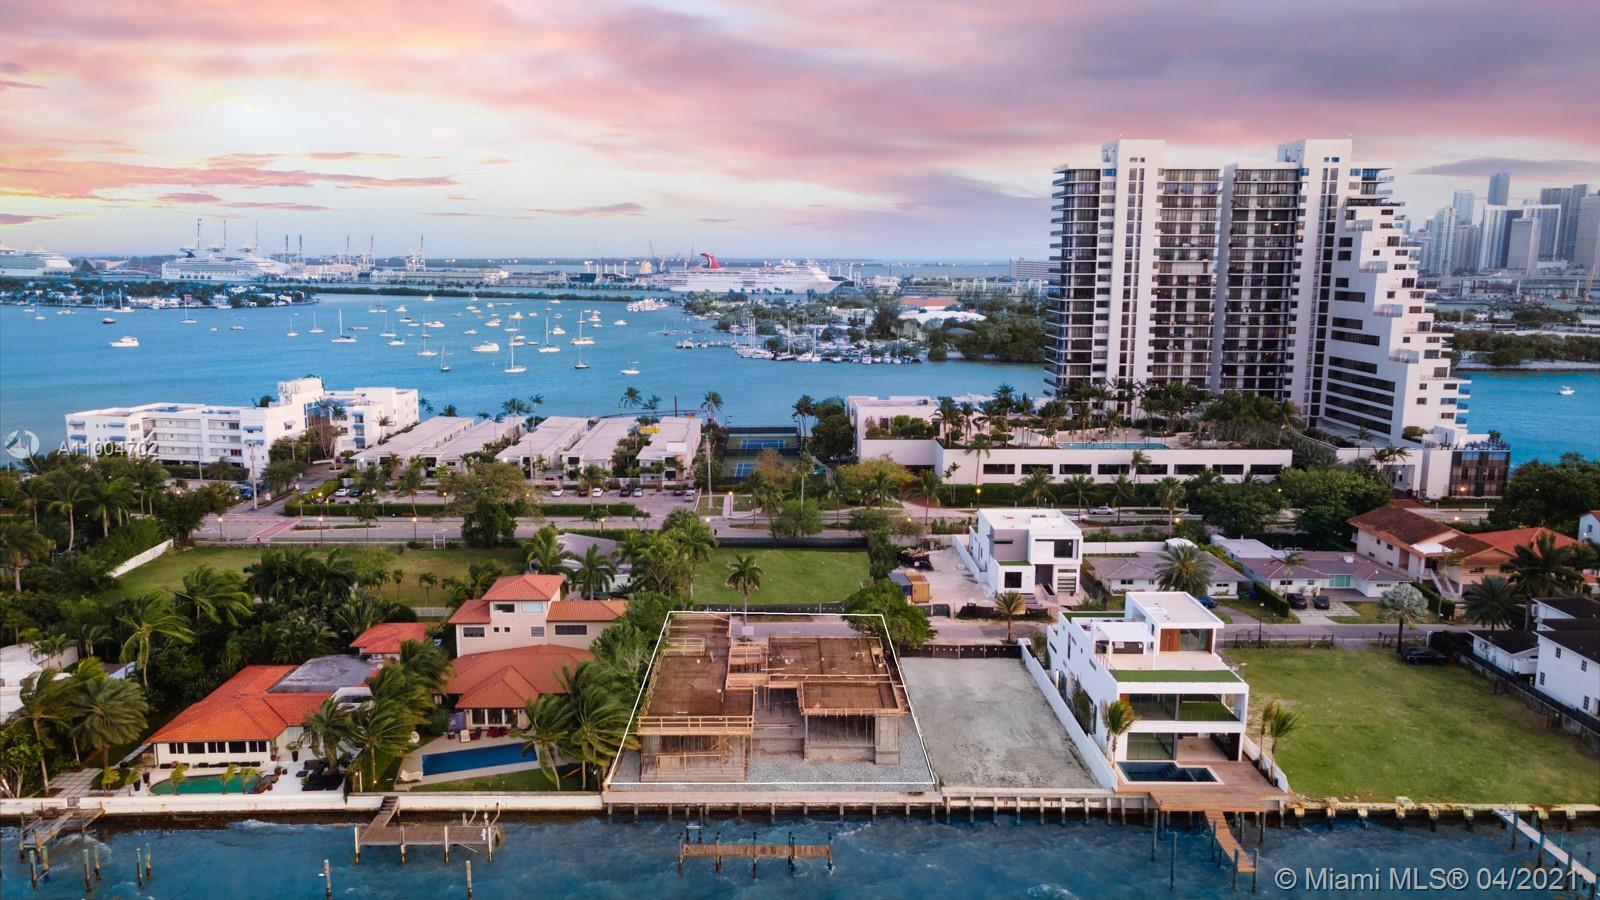 1061 N Venetian Dr, Miami FL 33139